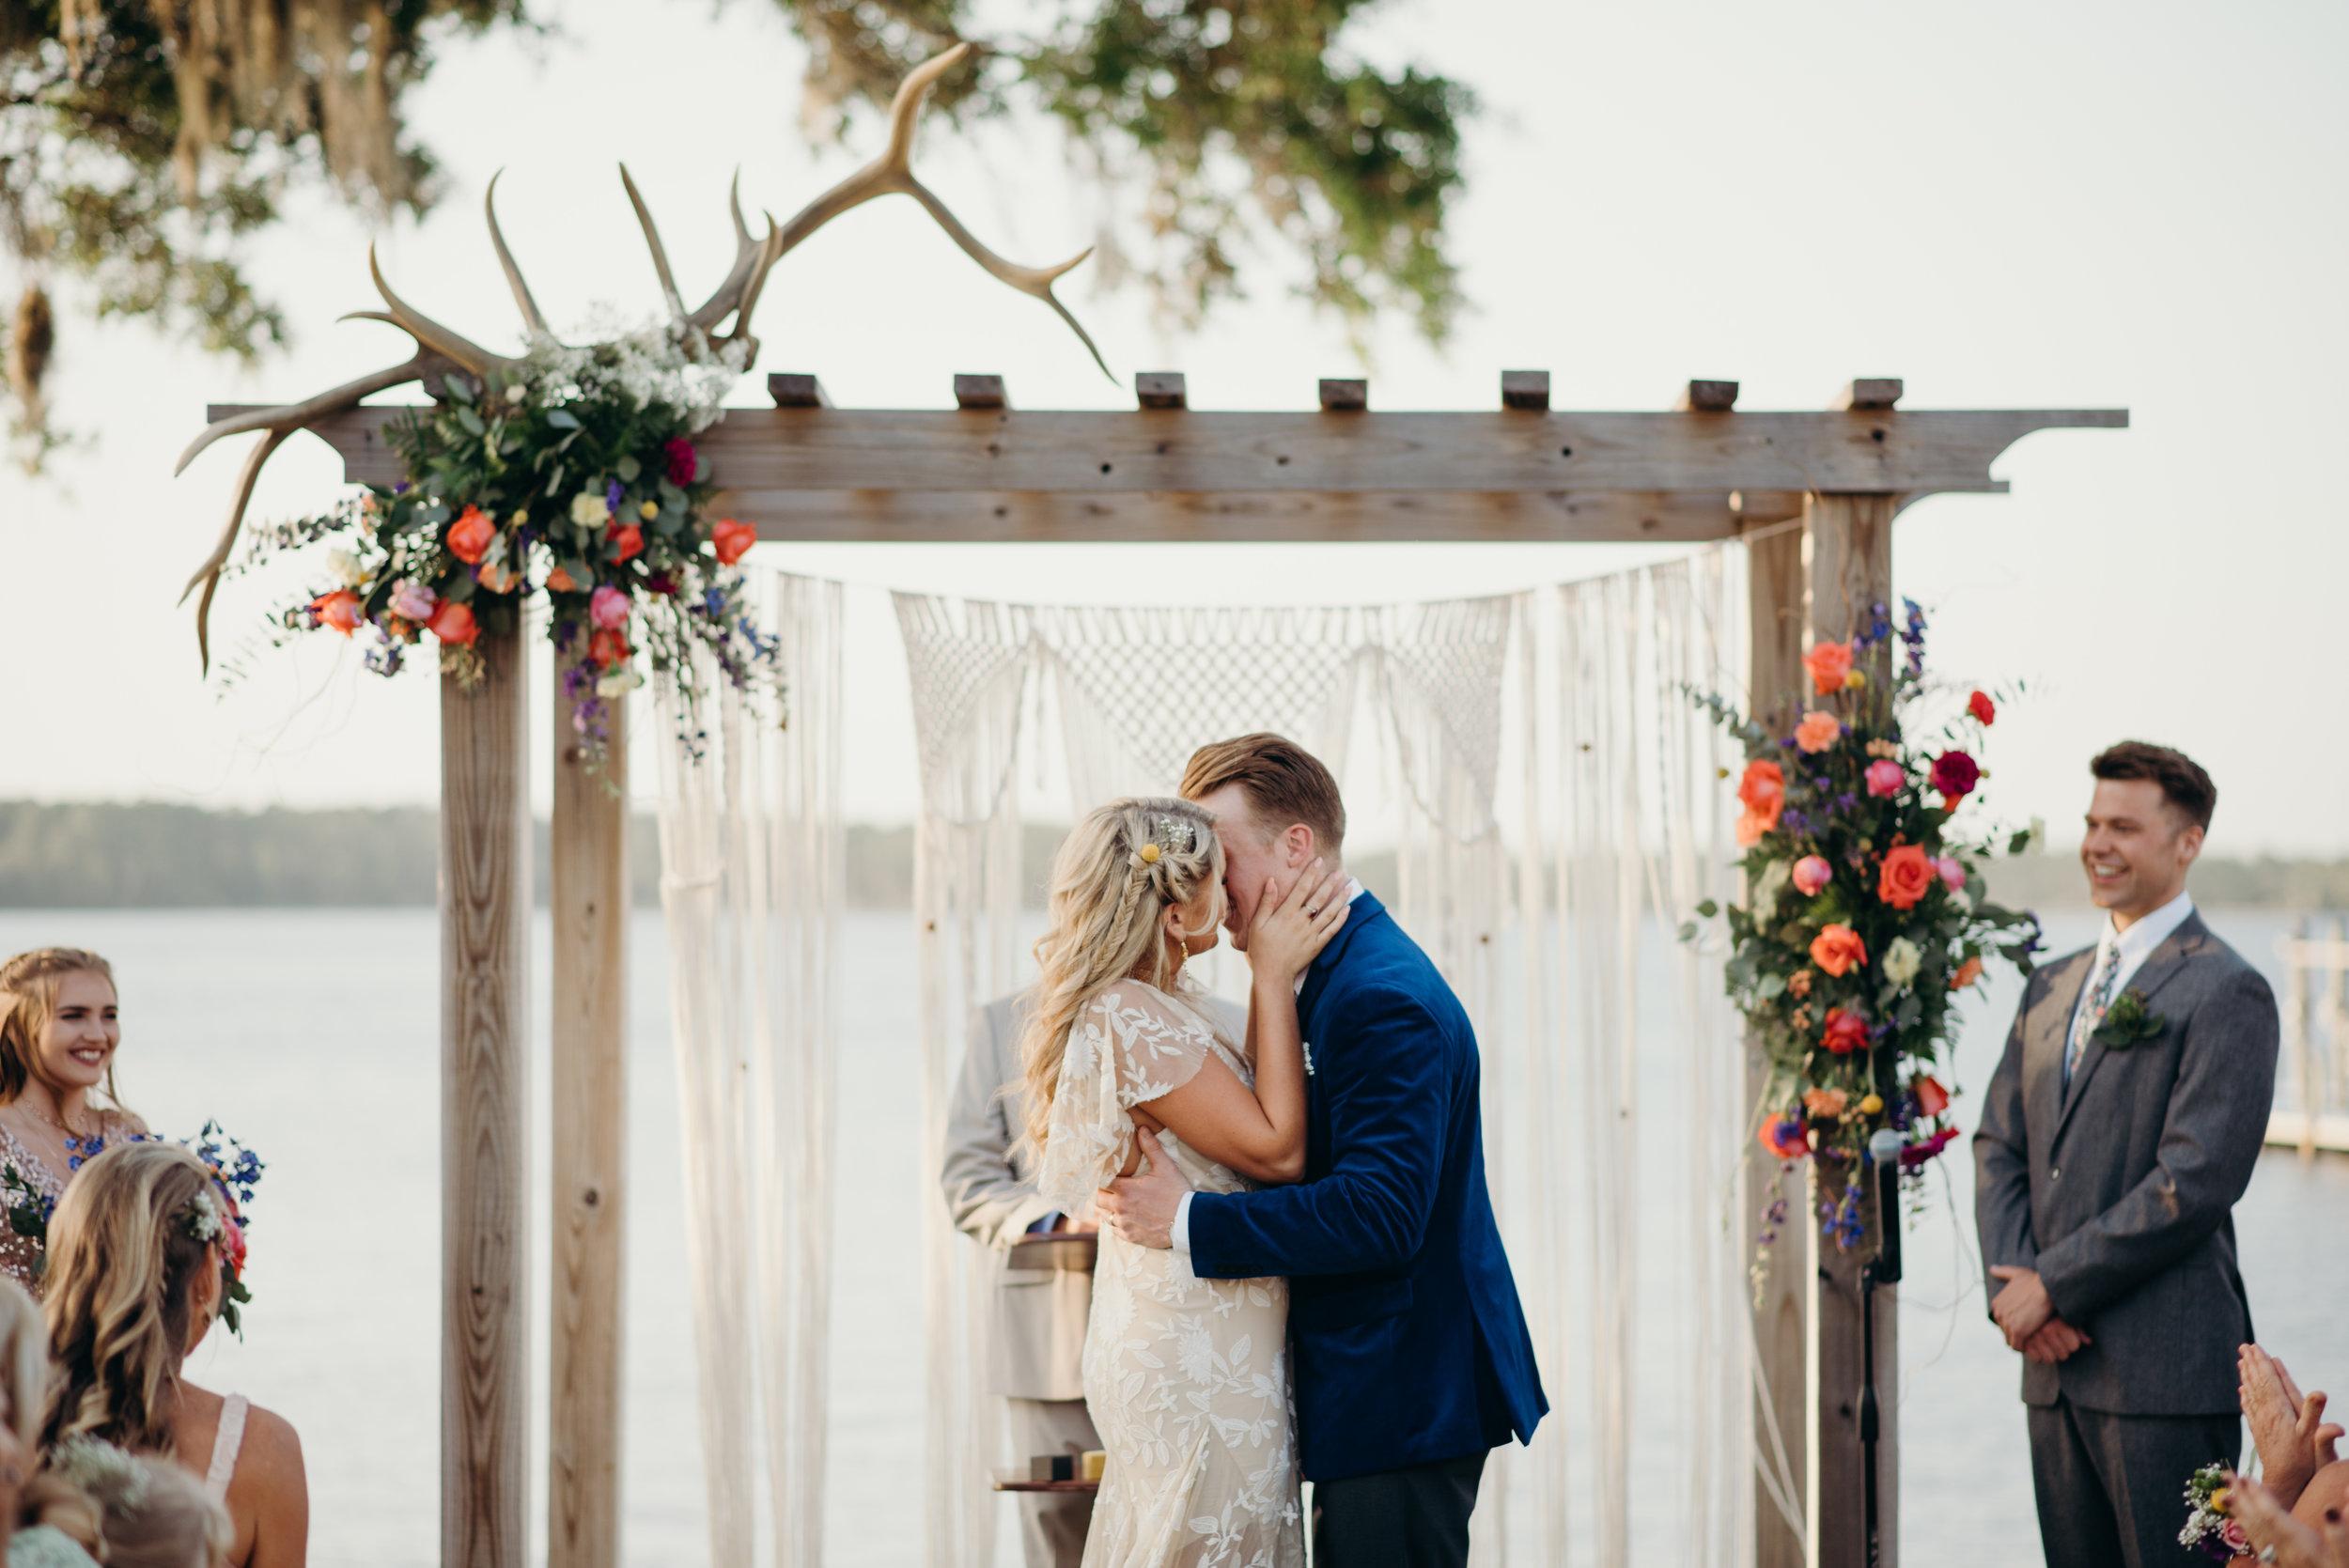 zayda-collin-panama-city-wedding-photography-trippy-bohemian-lisa-frank-wedding-ceremony-83.jpg